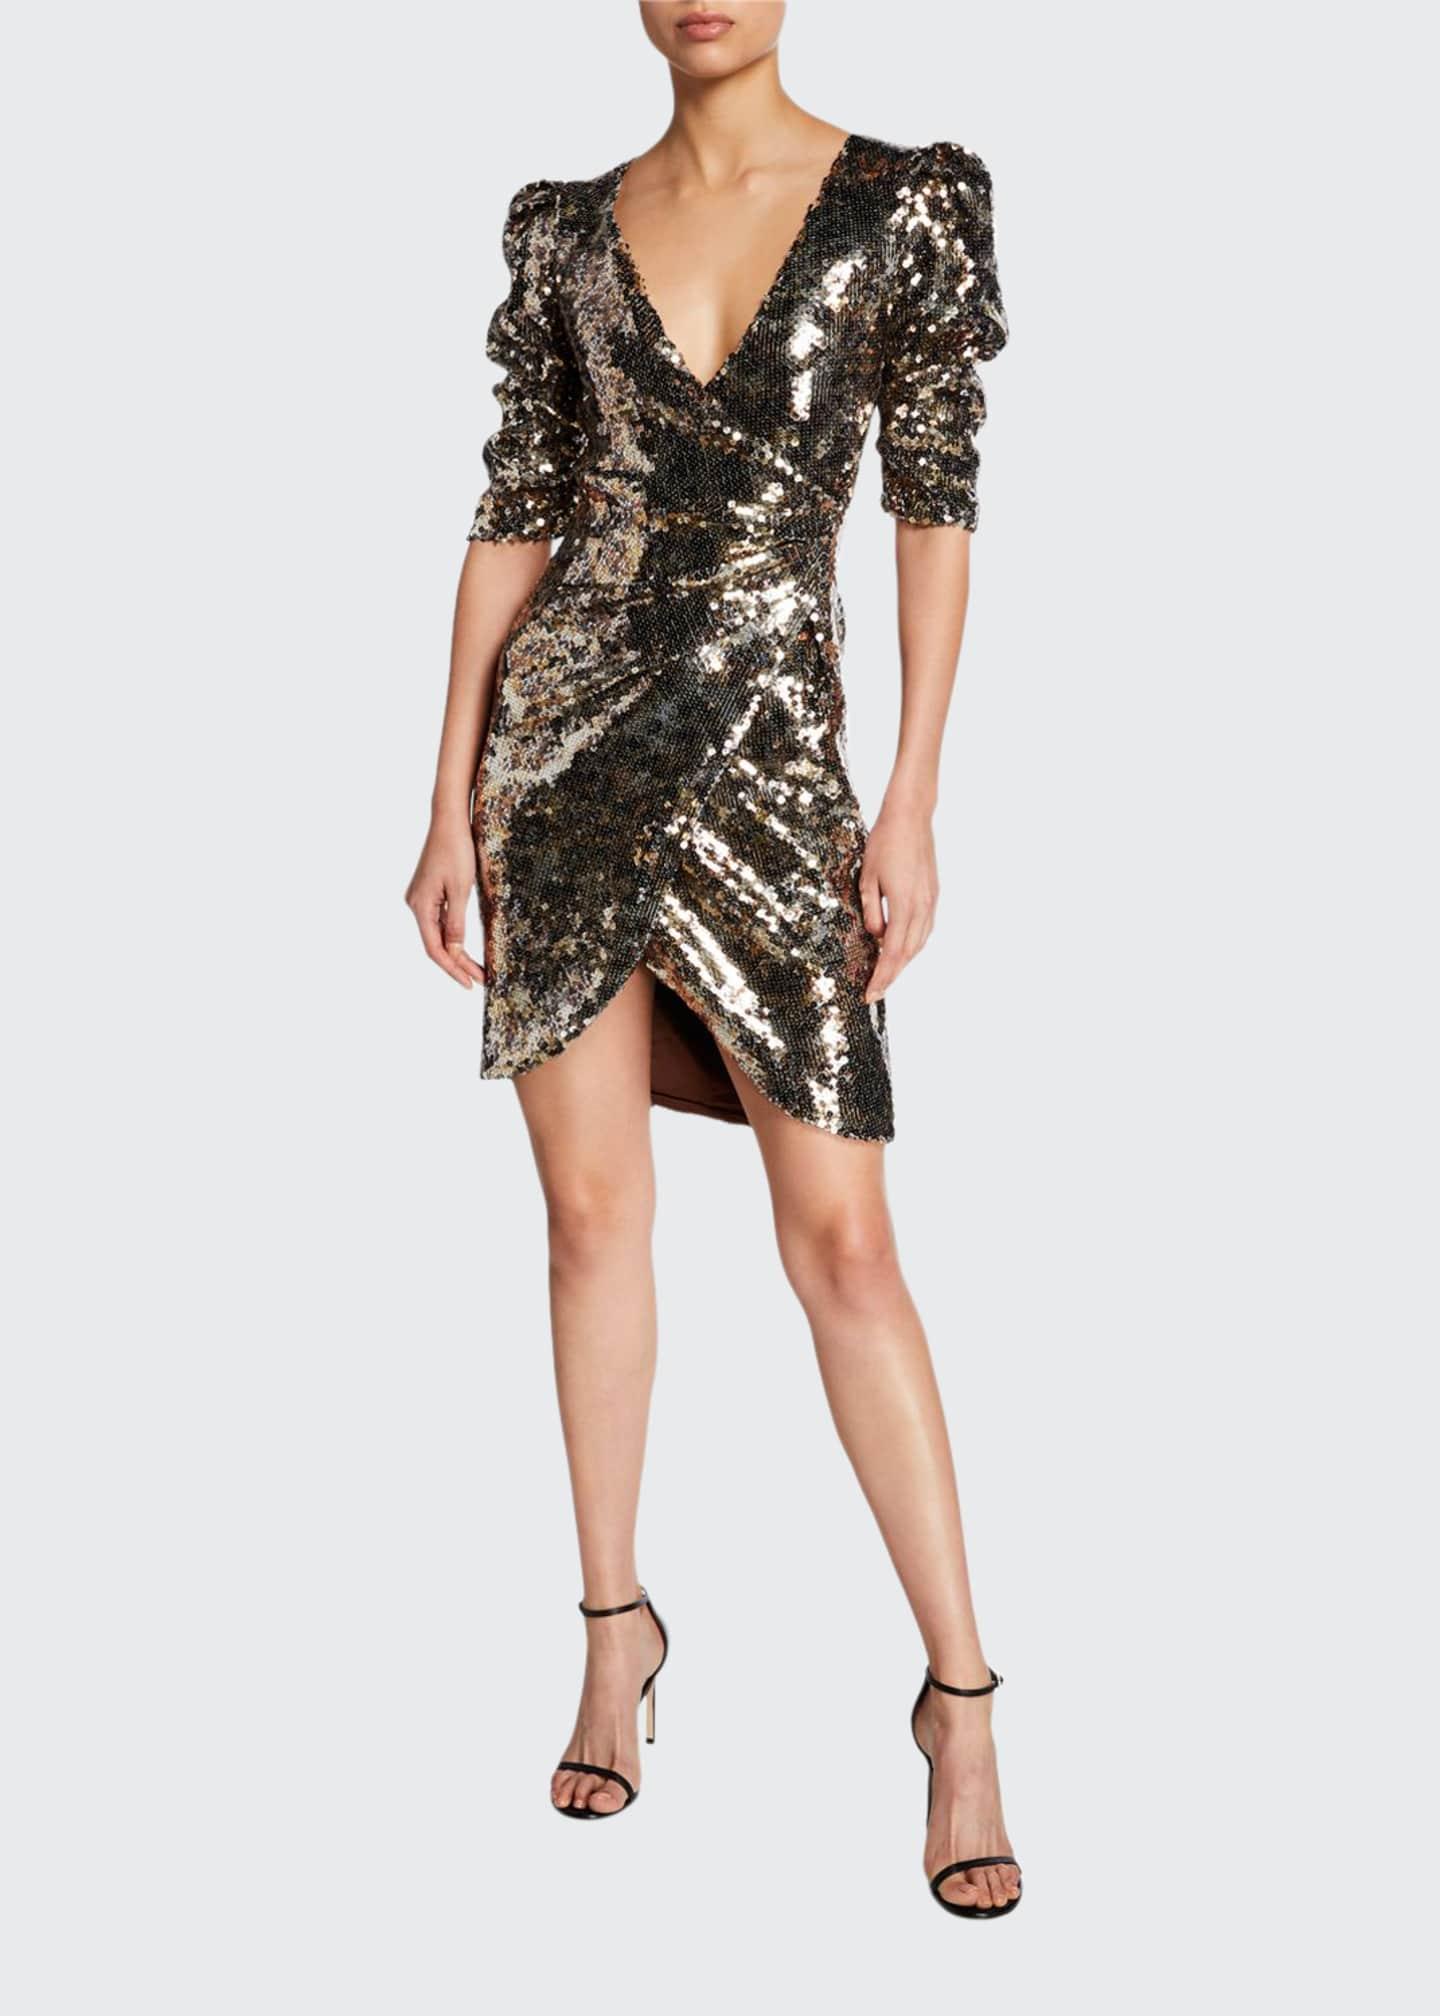 Monique Lhuillier Leopard-Print Sequined Ruched Half-Sleeve